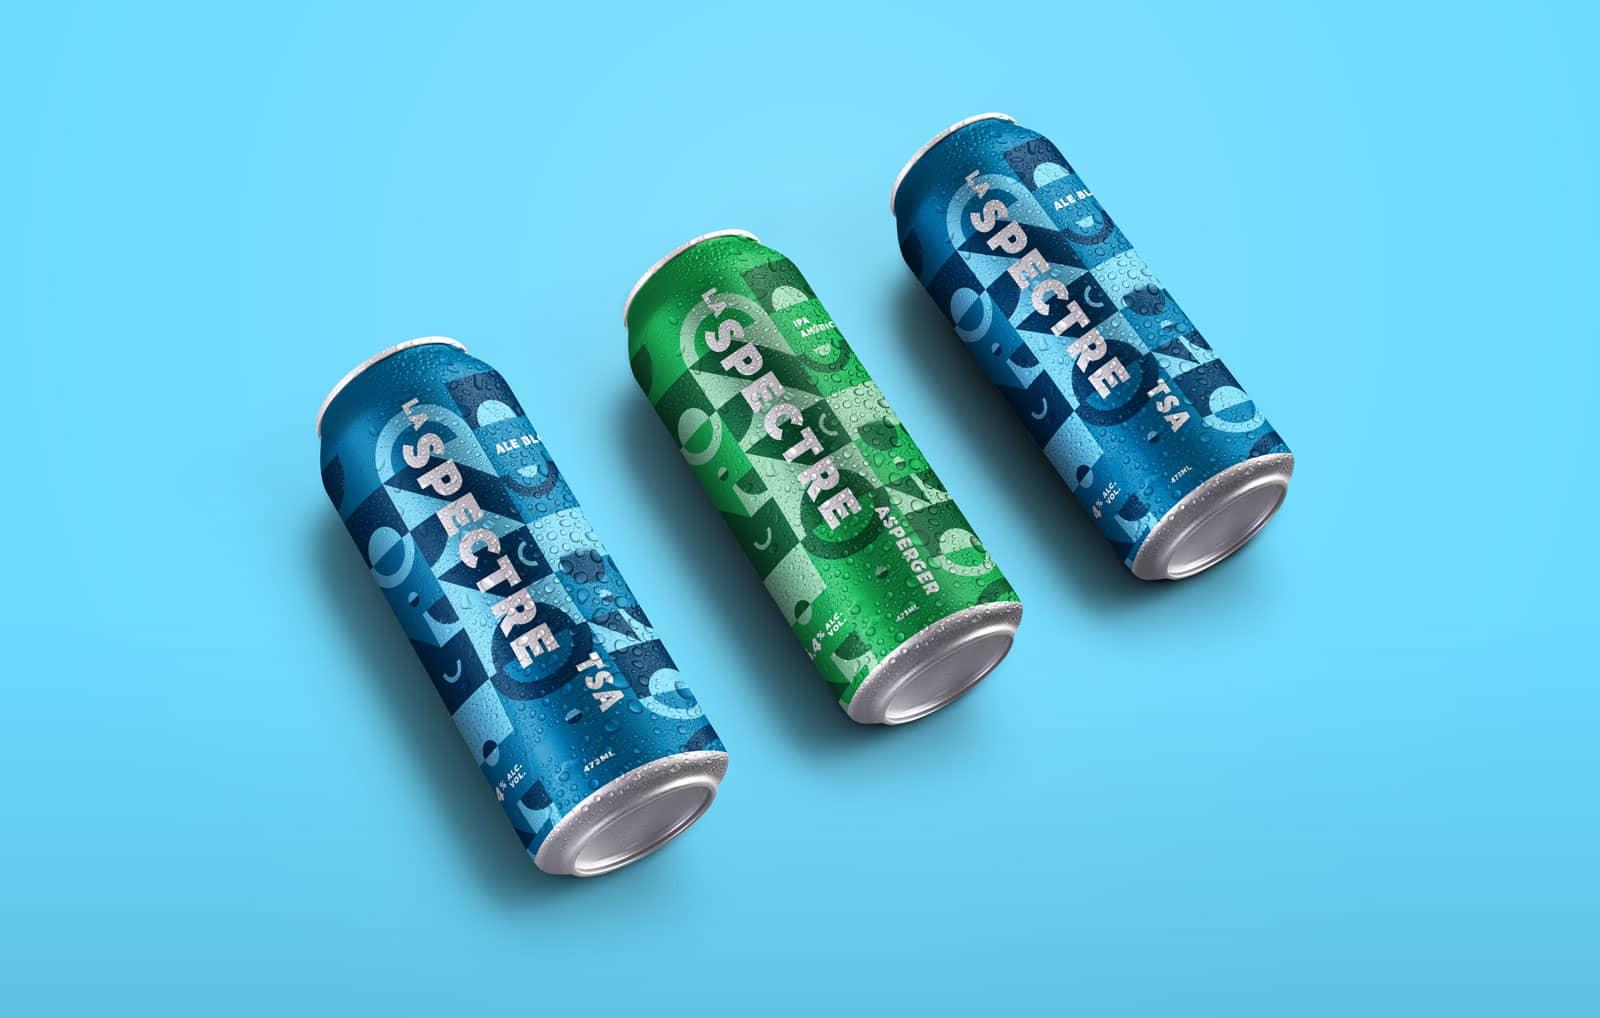 Biere-La-Spectre_Mockup_3-cannettes-couchees_compressor